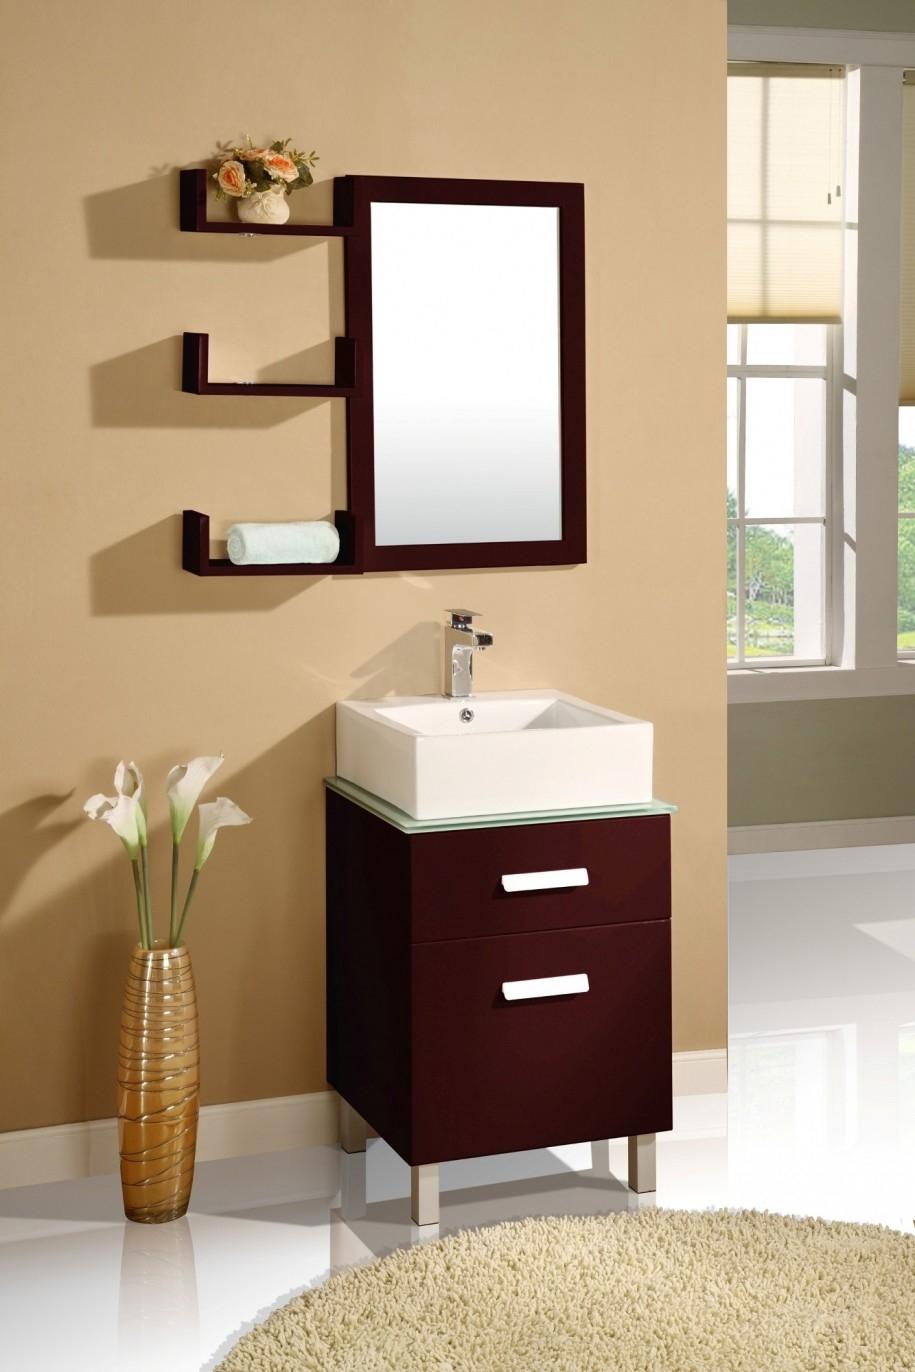 Bathroom Mirror And Shelf Ideassimple dark wood bathroom mirrors with shelves and small dark wood